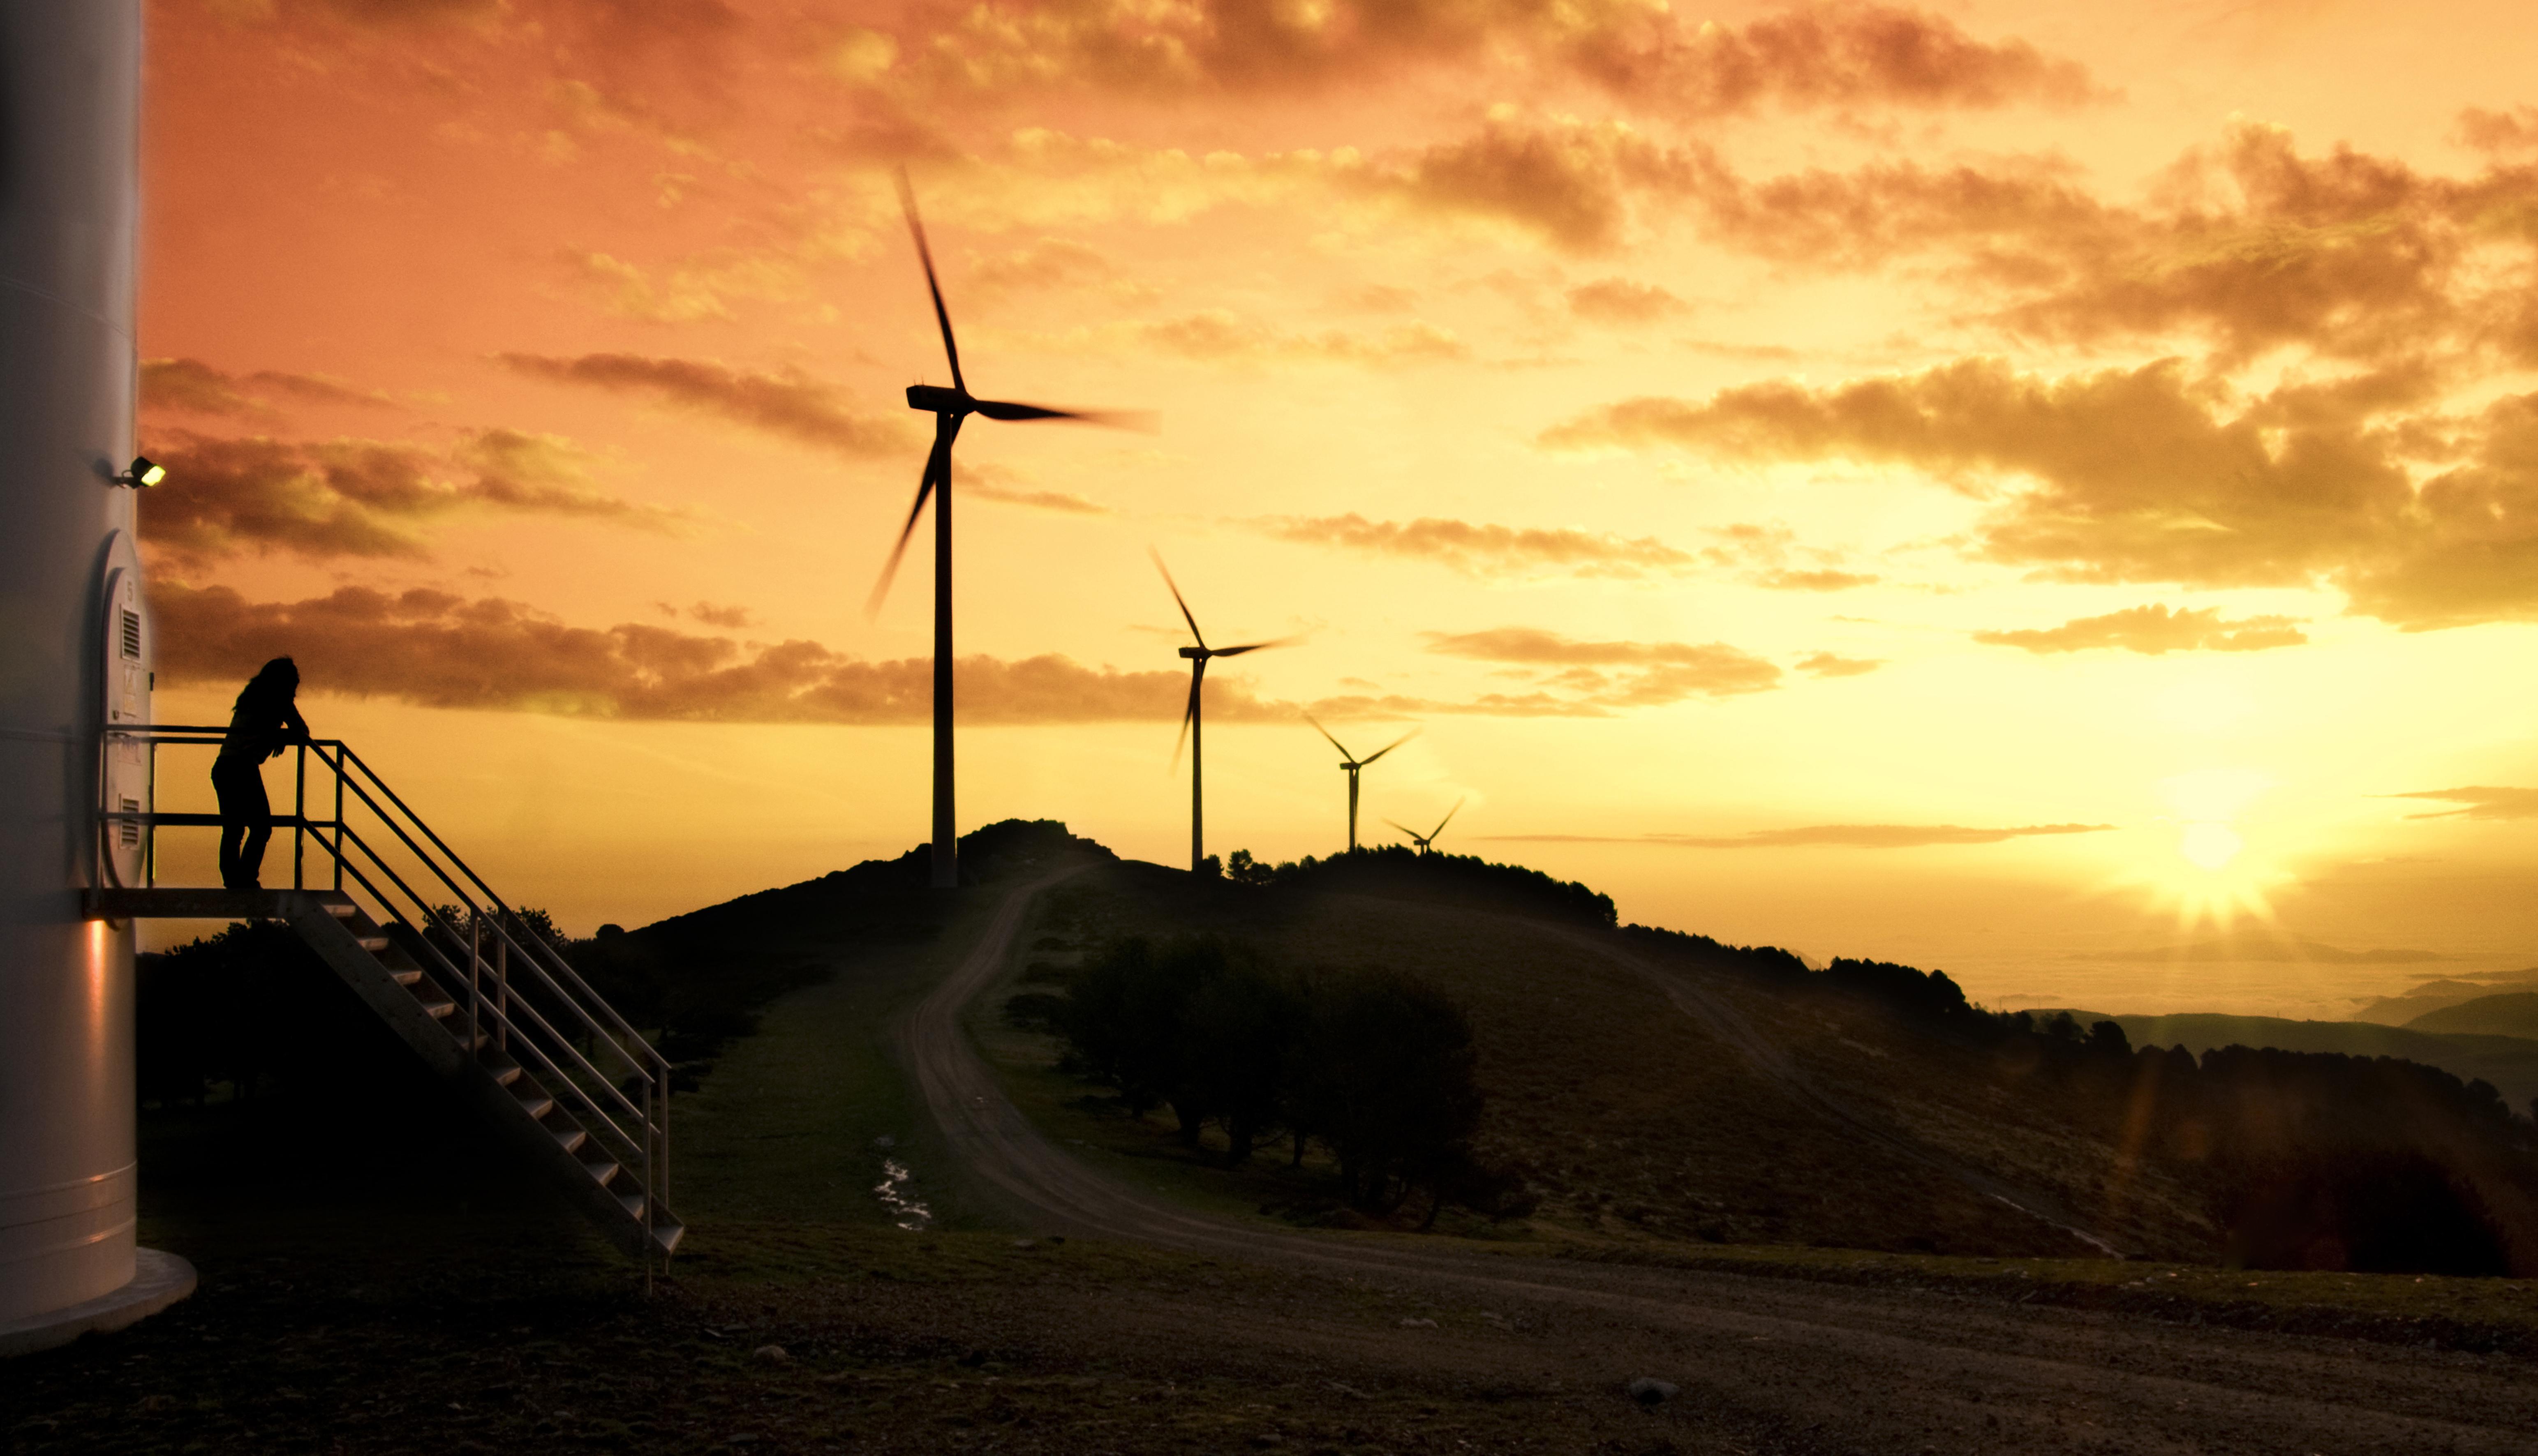 http://www.evwind.com/2013/08/13/eolica-en-andalucia-almeria-cuenta-51125-mw-eolicos/